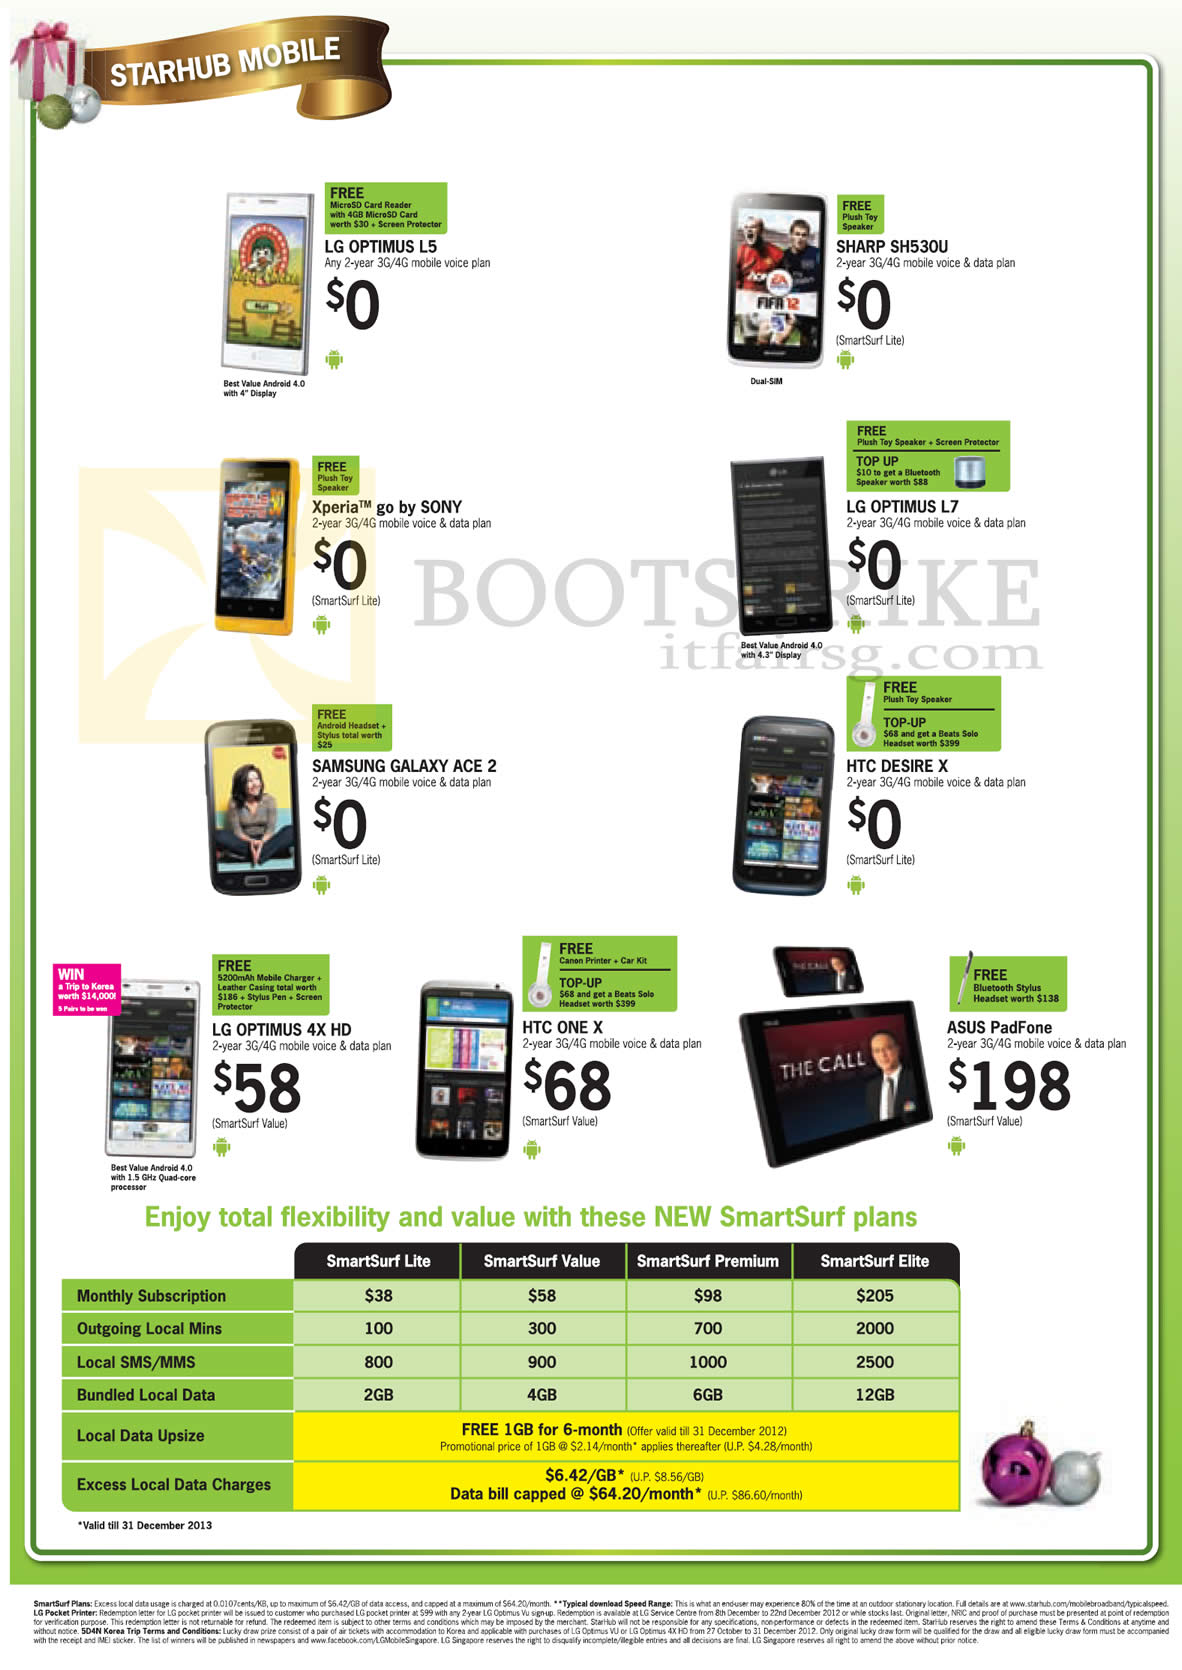 SITEX 2012 price list image brochure of Starhub Mobile Phones LG Optimus L5 L7 4X HD, Sharp SH530U, Sony Xperia Go, Samsung Galaxy Ace 2, HTC Desire X One X, ASUS PadFone